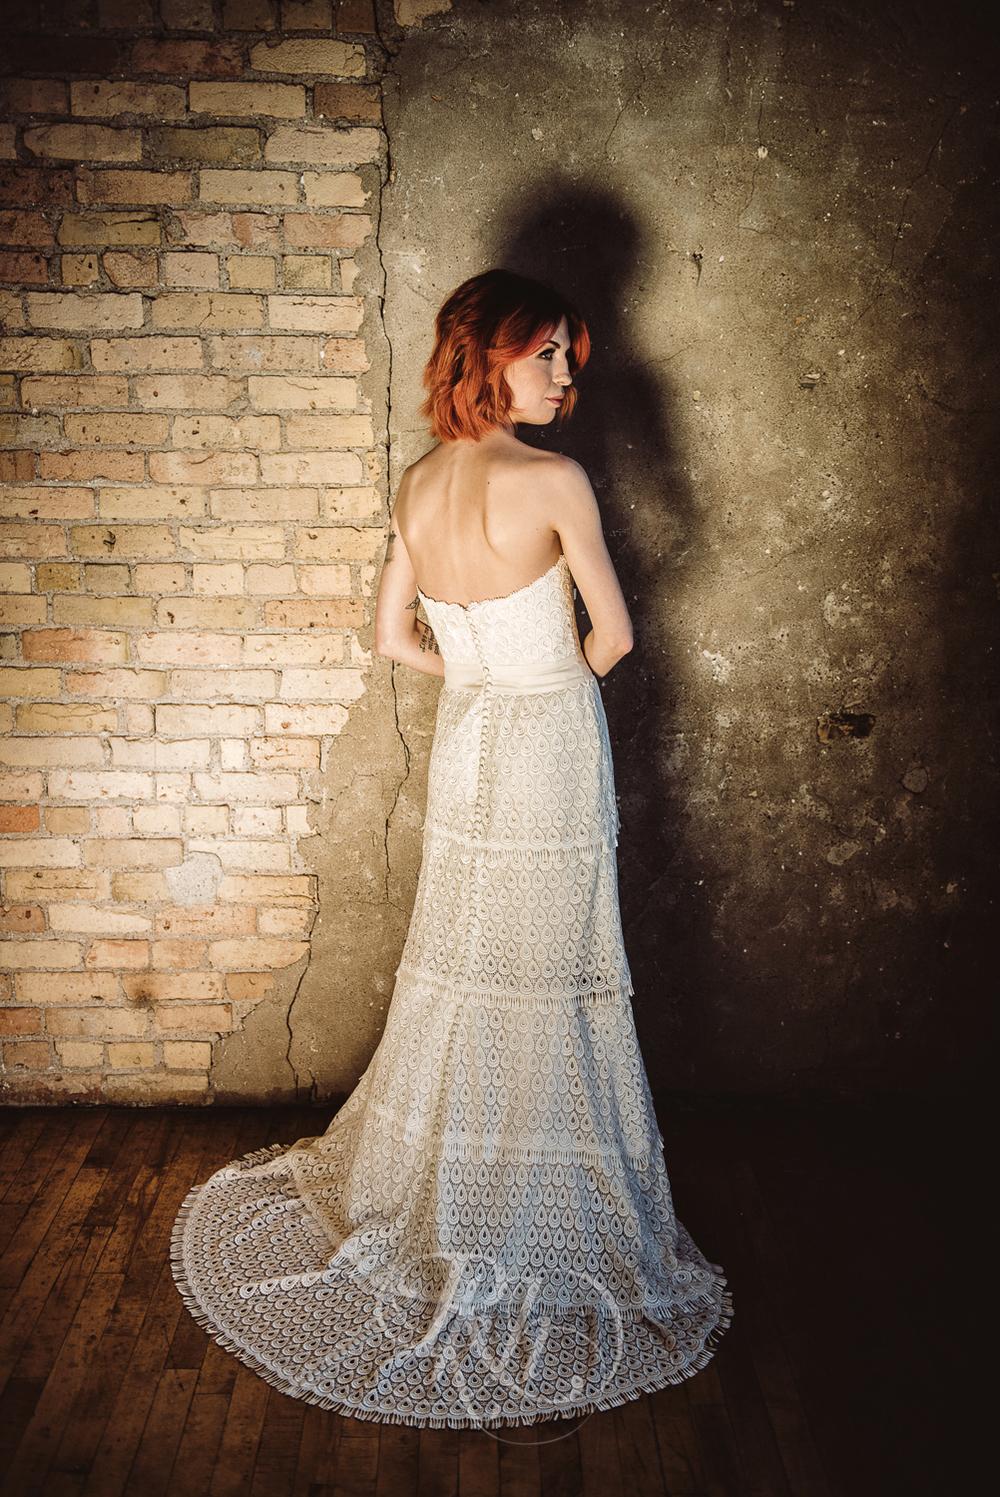 Minneapolis Wedding Shoot - RKH Images - Minnesota Wedding Photographer - Samples-11